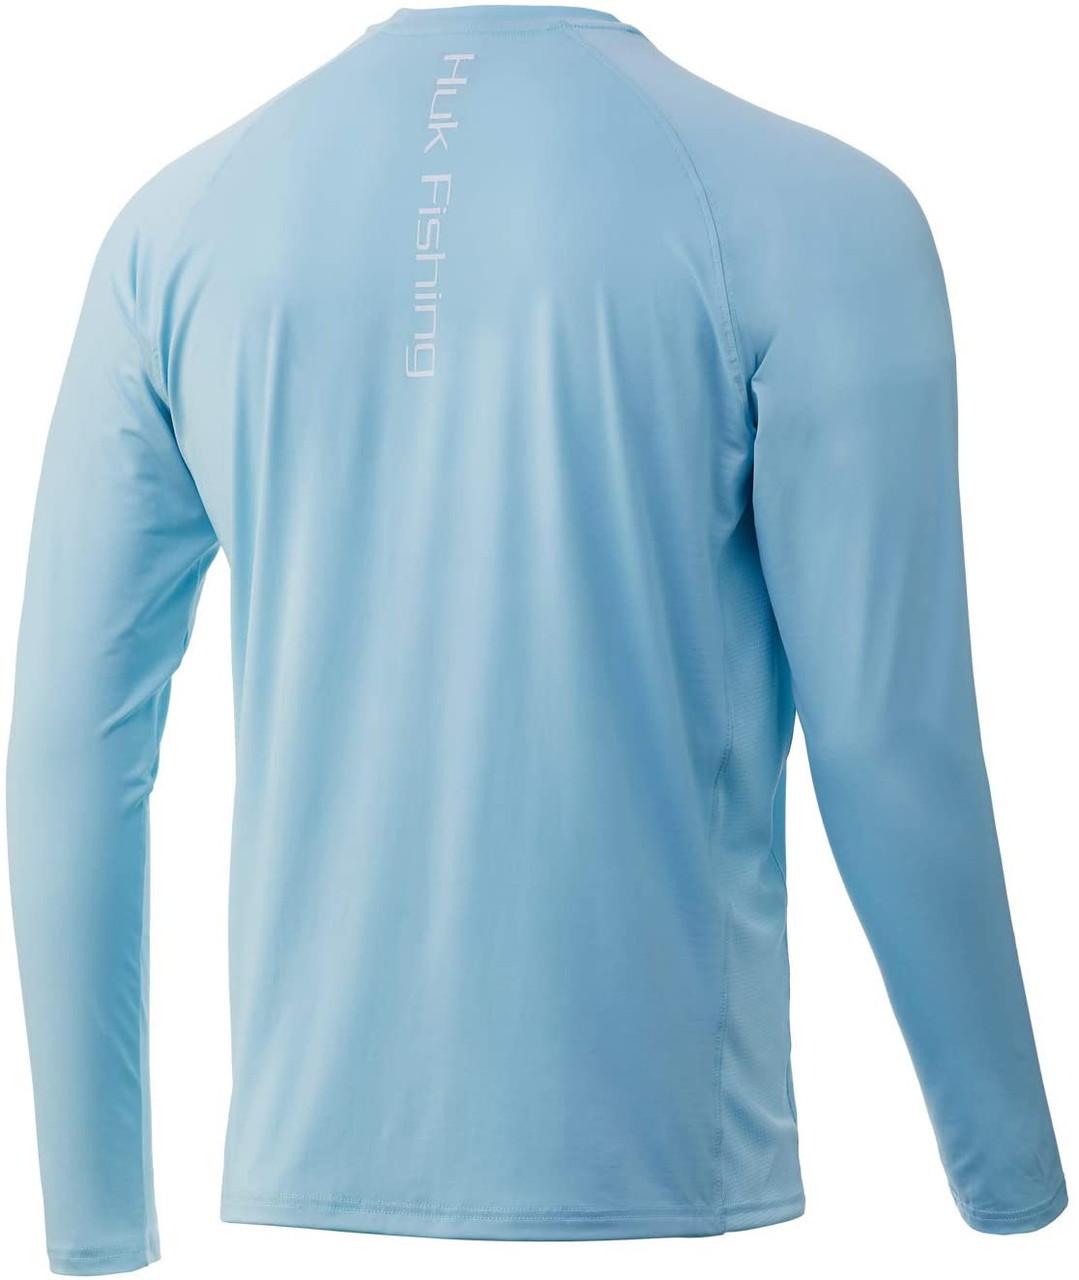 HUK H1200150-450 Pursuit Vented Performance Shirt Ice Blue - Back